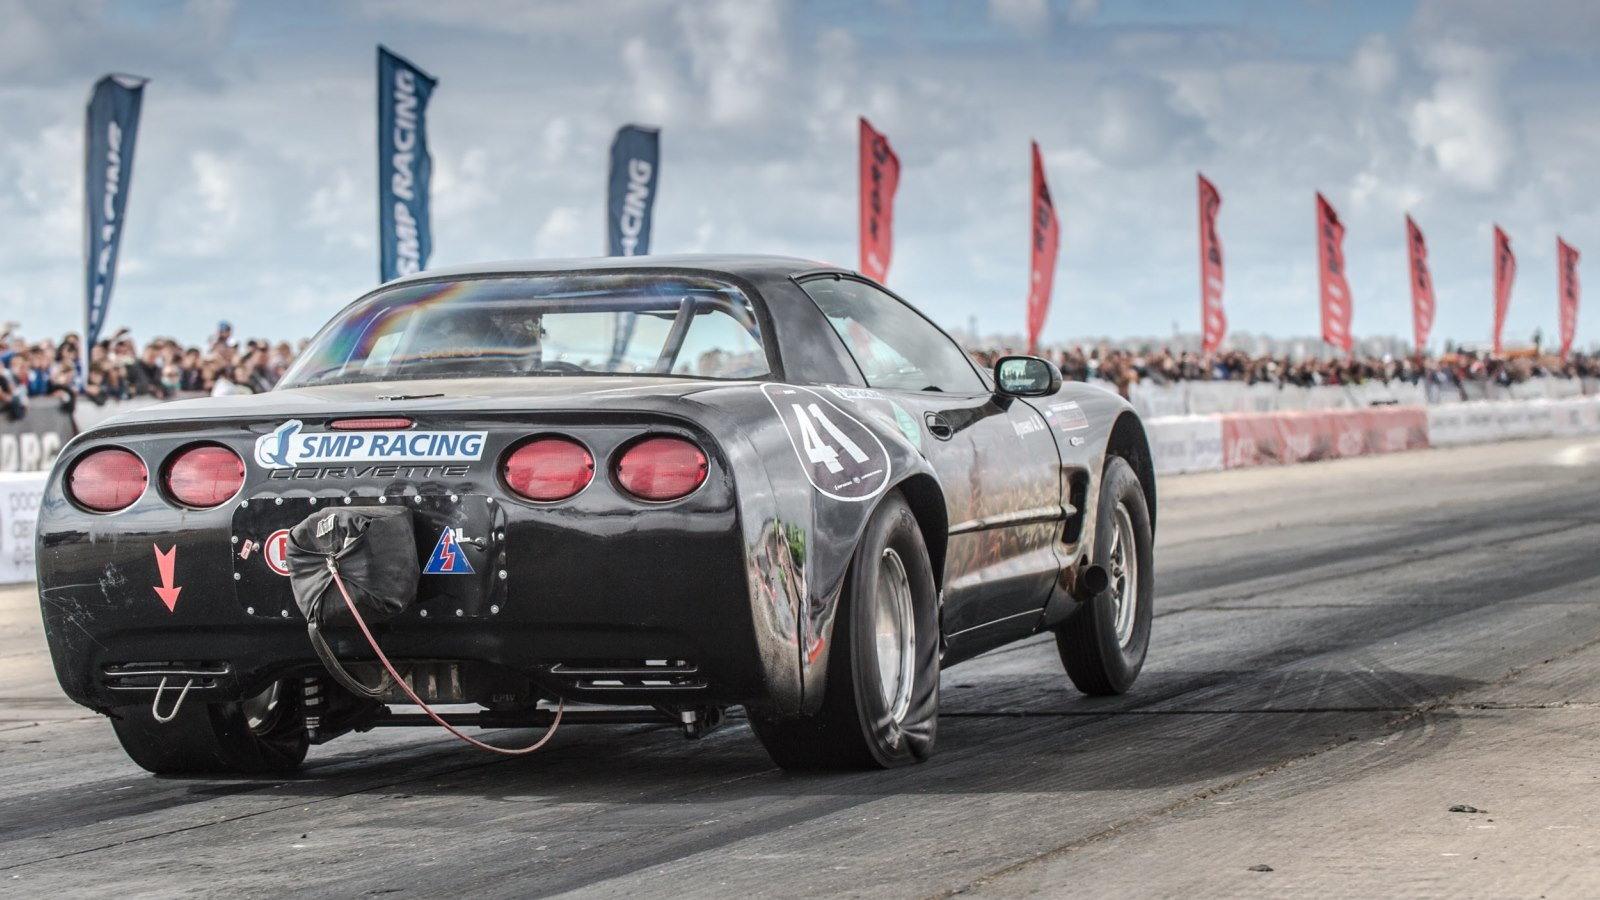 gear ratios C5 C6 Corvette drag racing